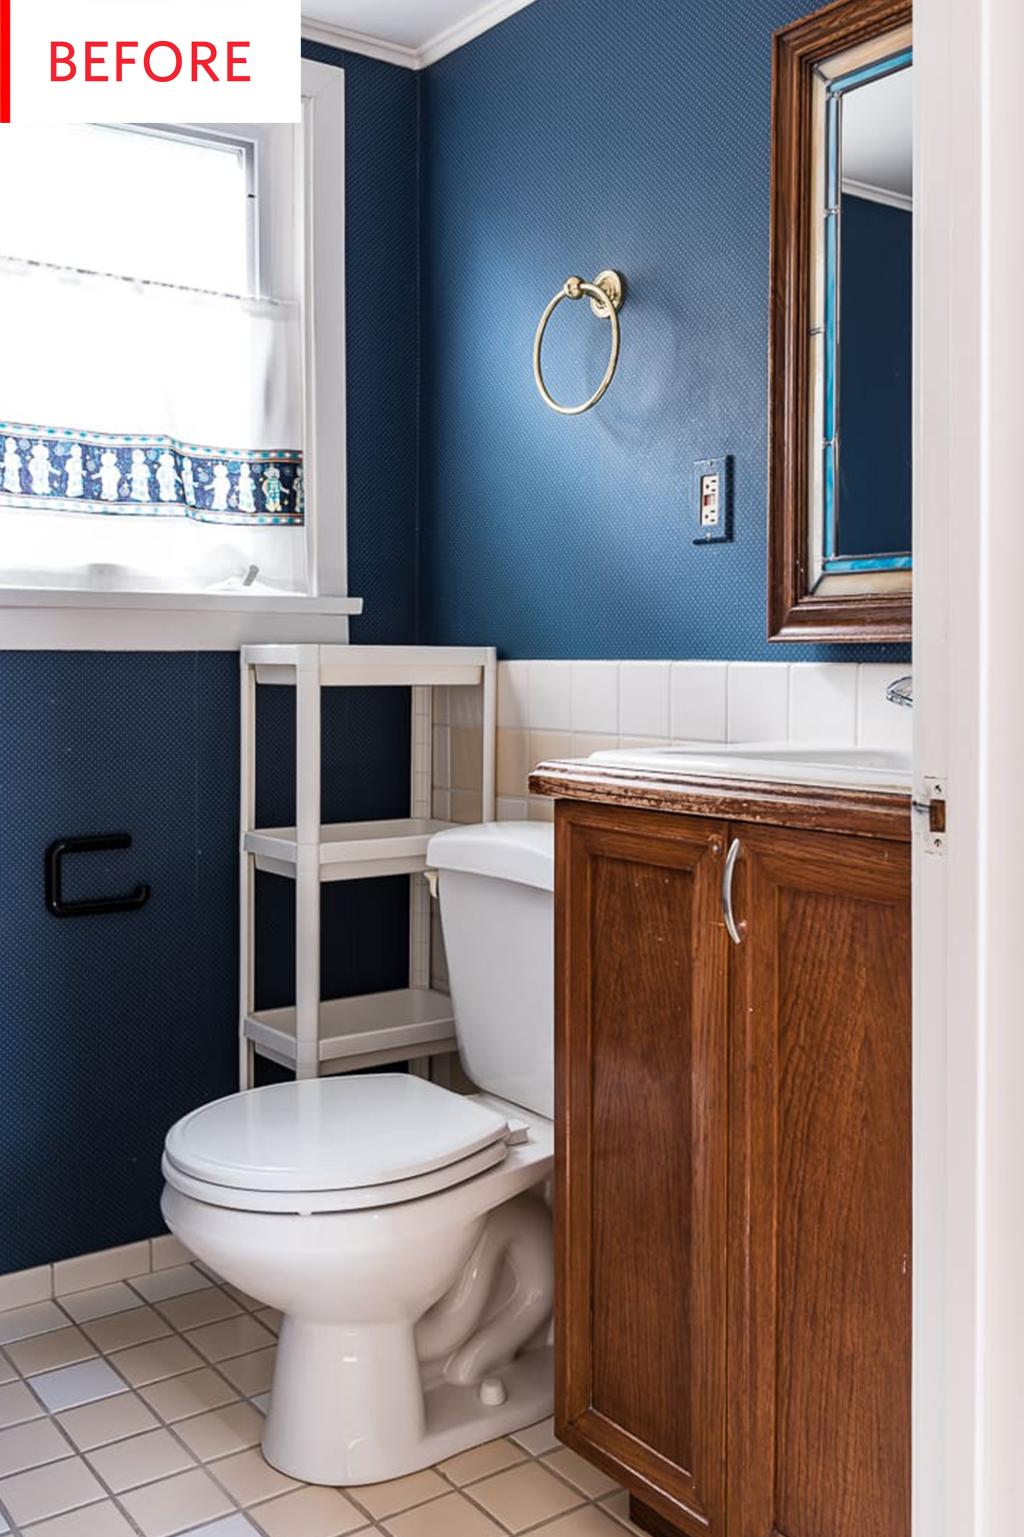 Painted tile bathroom floor before after photos - Half bathroom remodel ideas ...